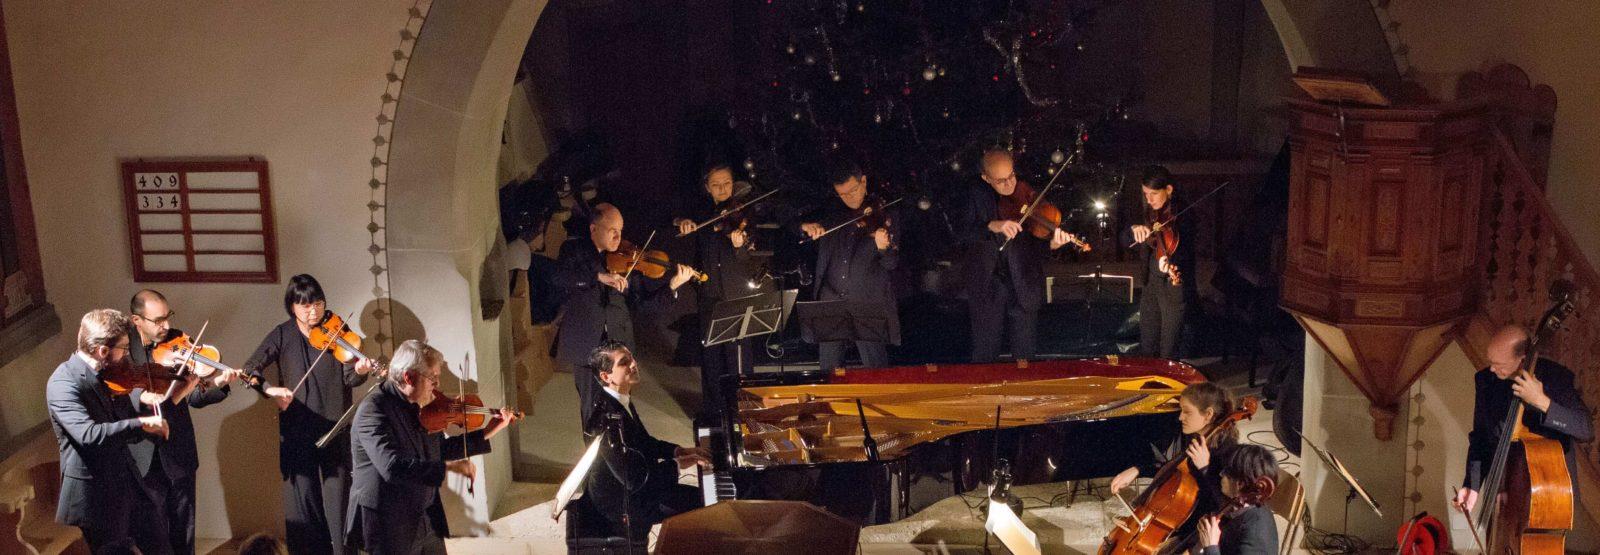 Gstaad New Year Music Festival Eglise de Lauenen